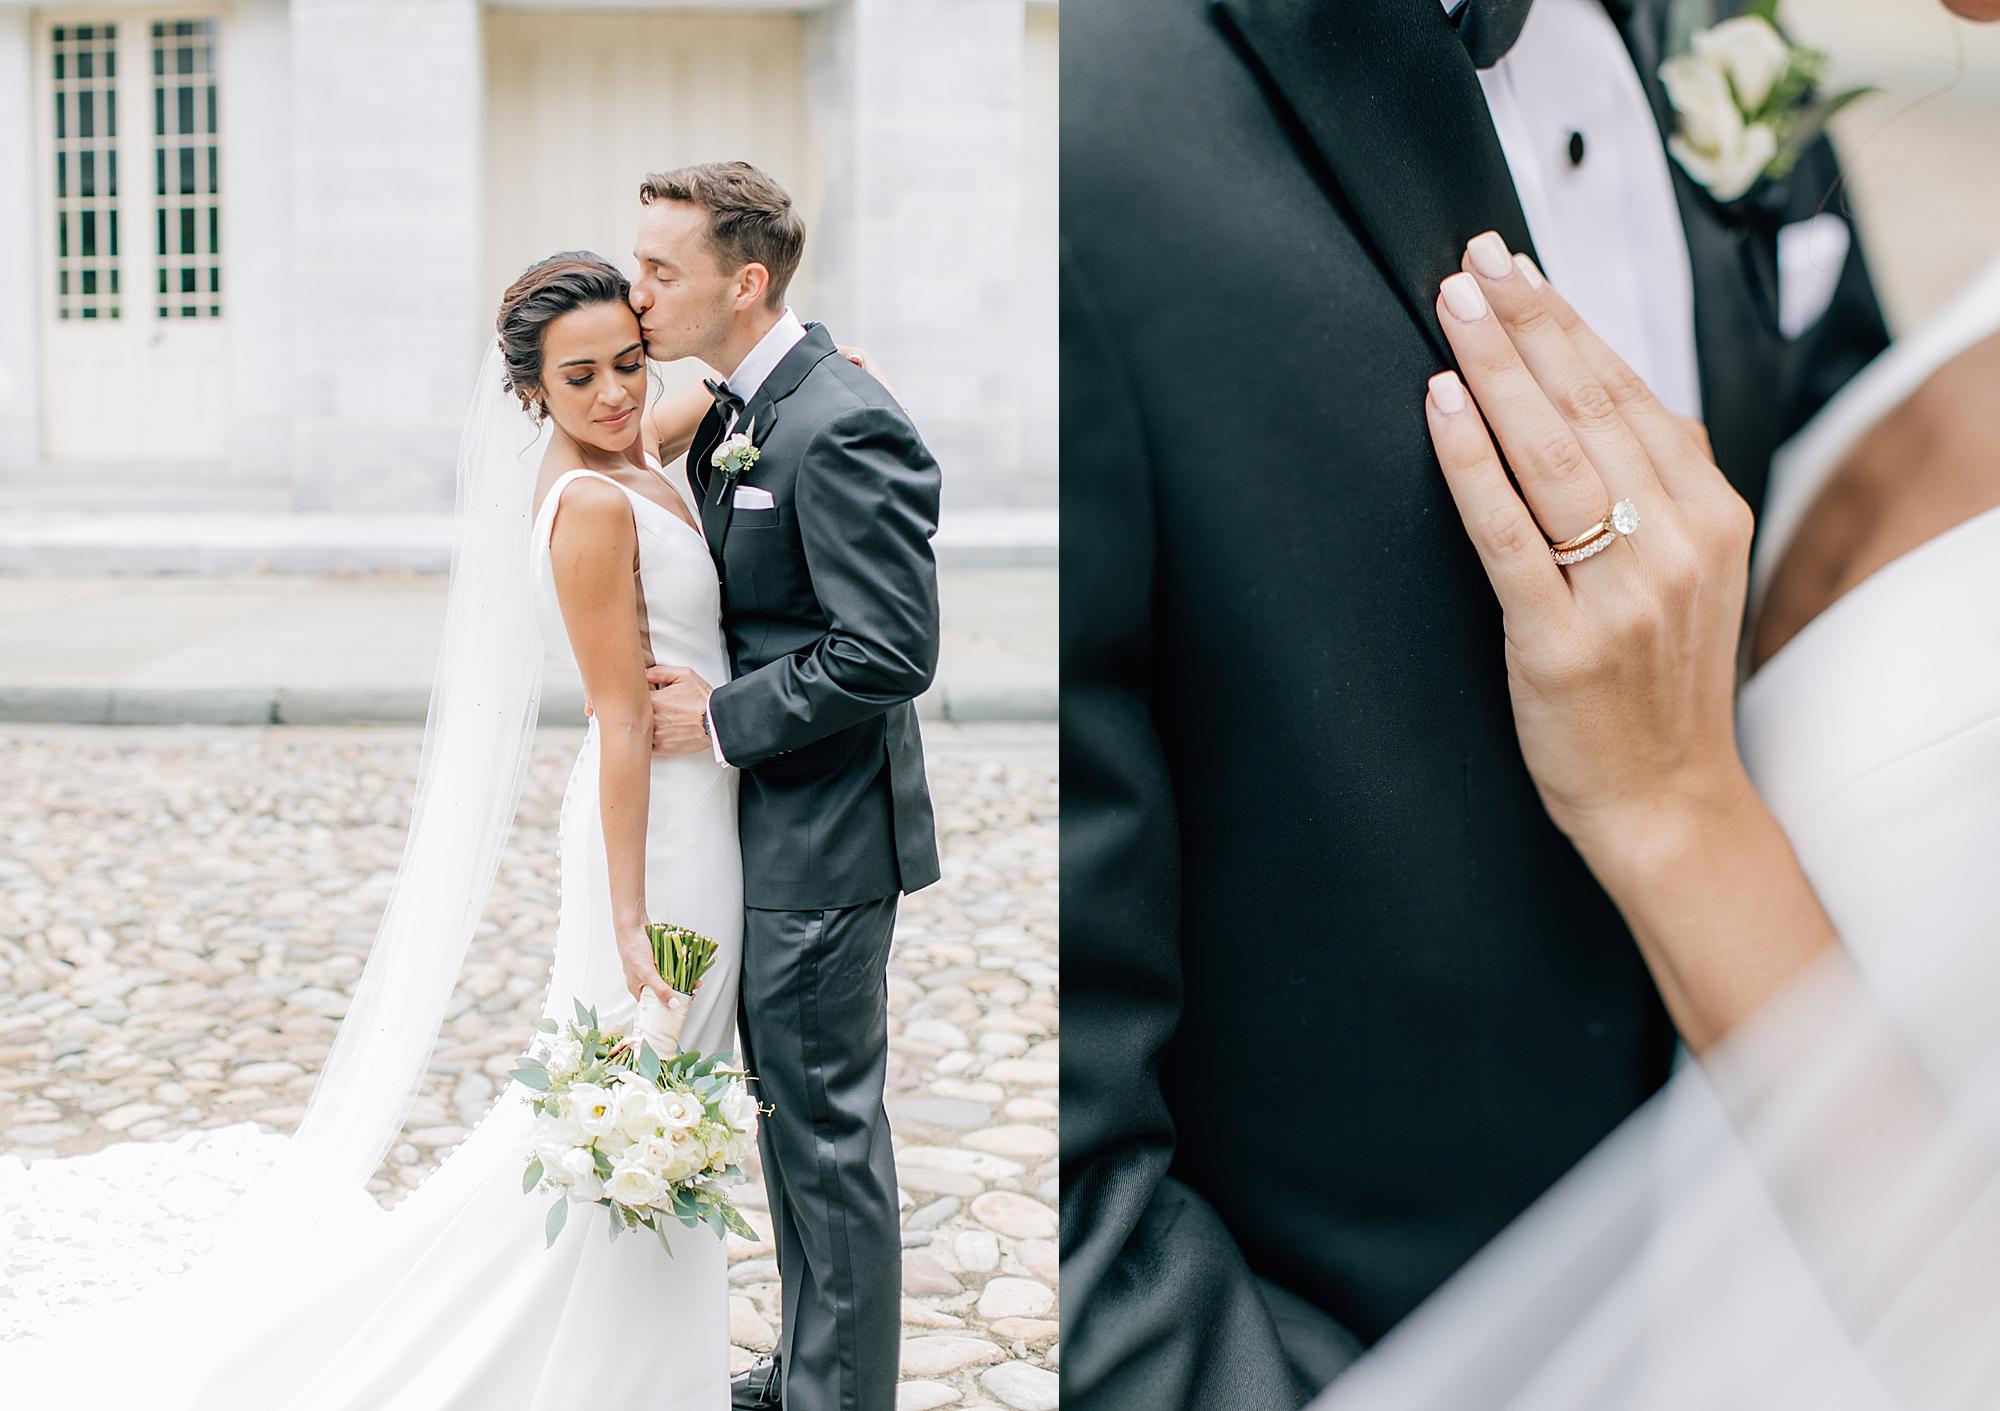 Cescaphe Philadelphia Film Wedding Photography by Magdalena Studios 32